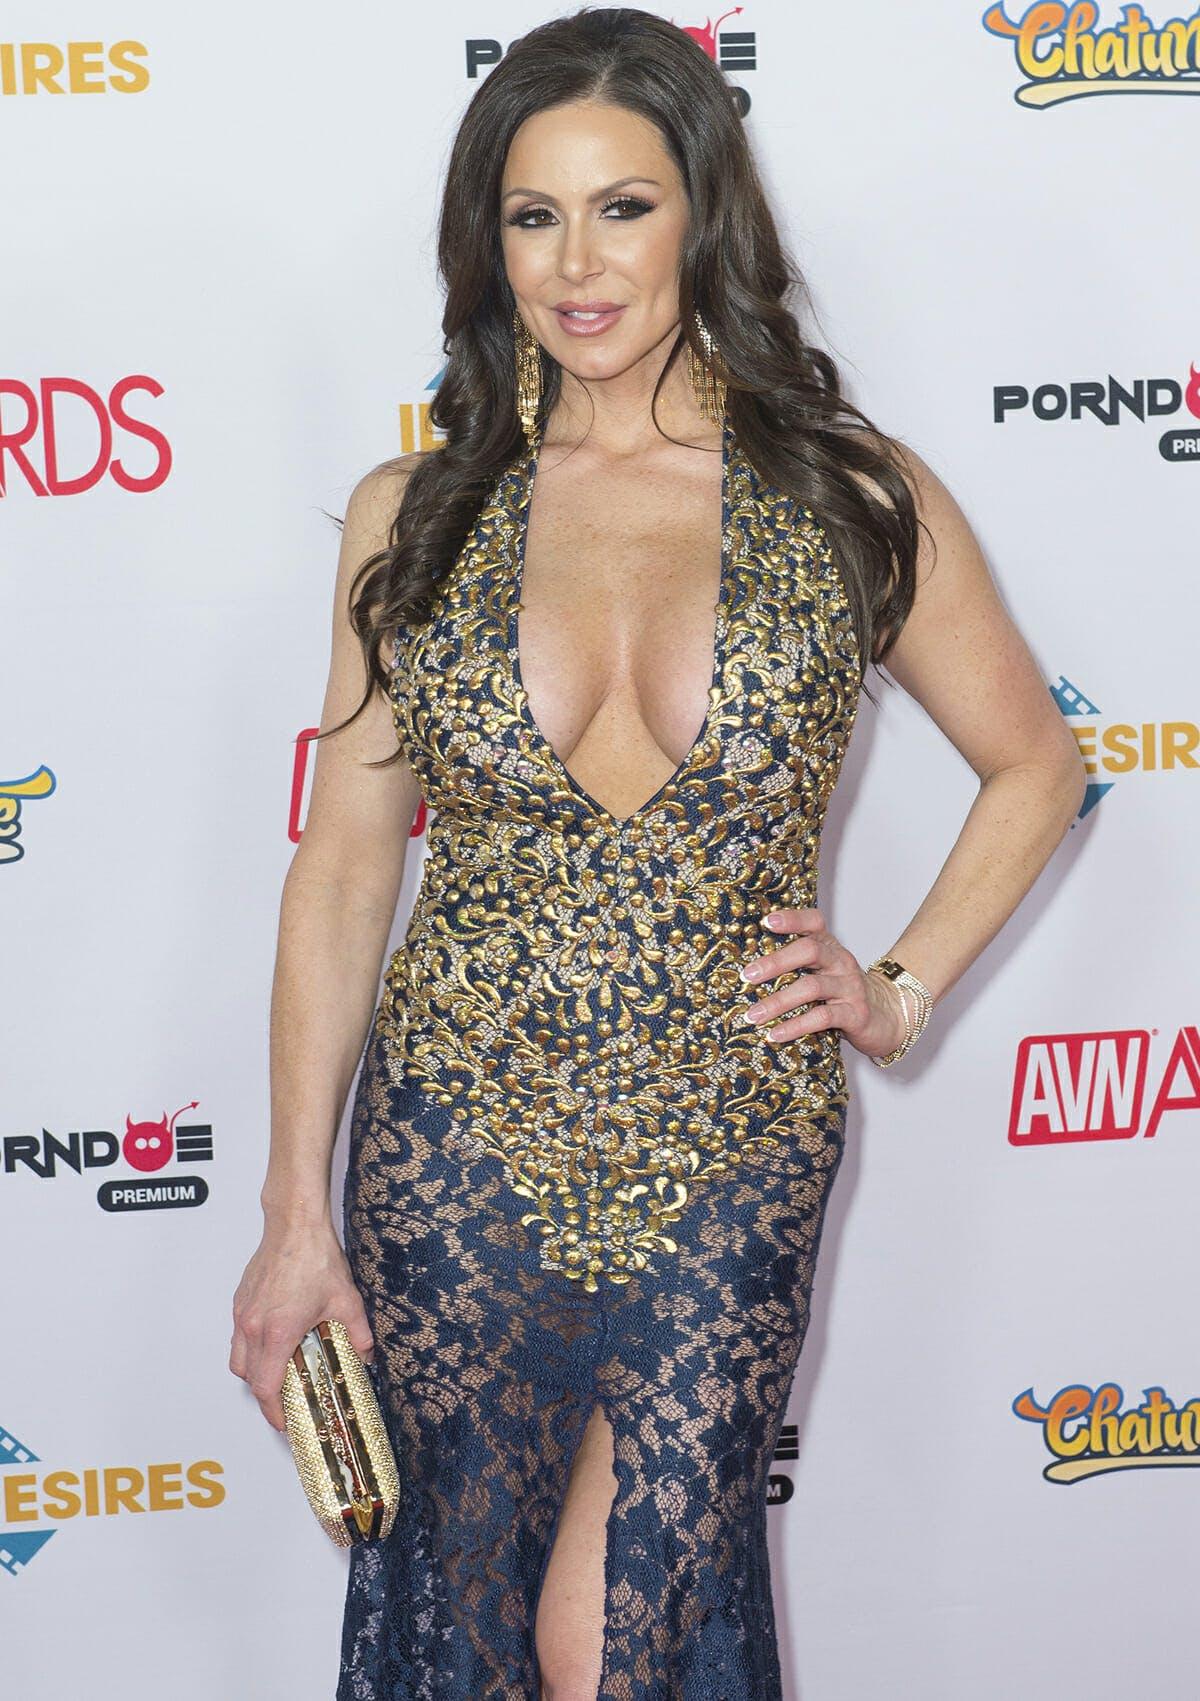 Kendra Lust top porn stars naughty america